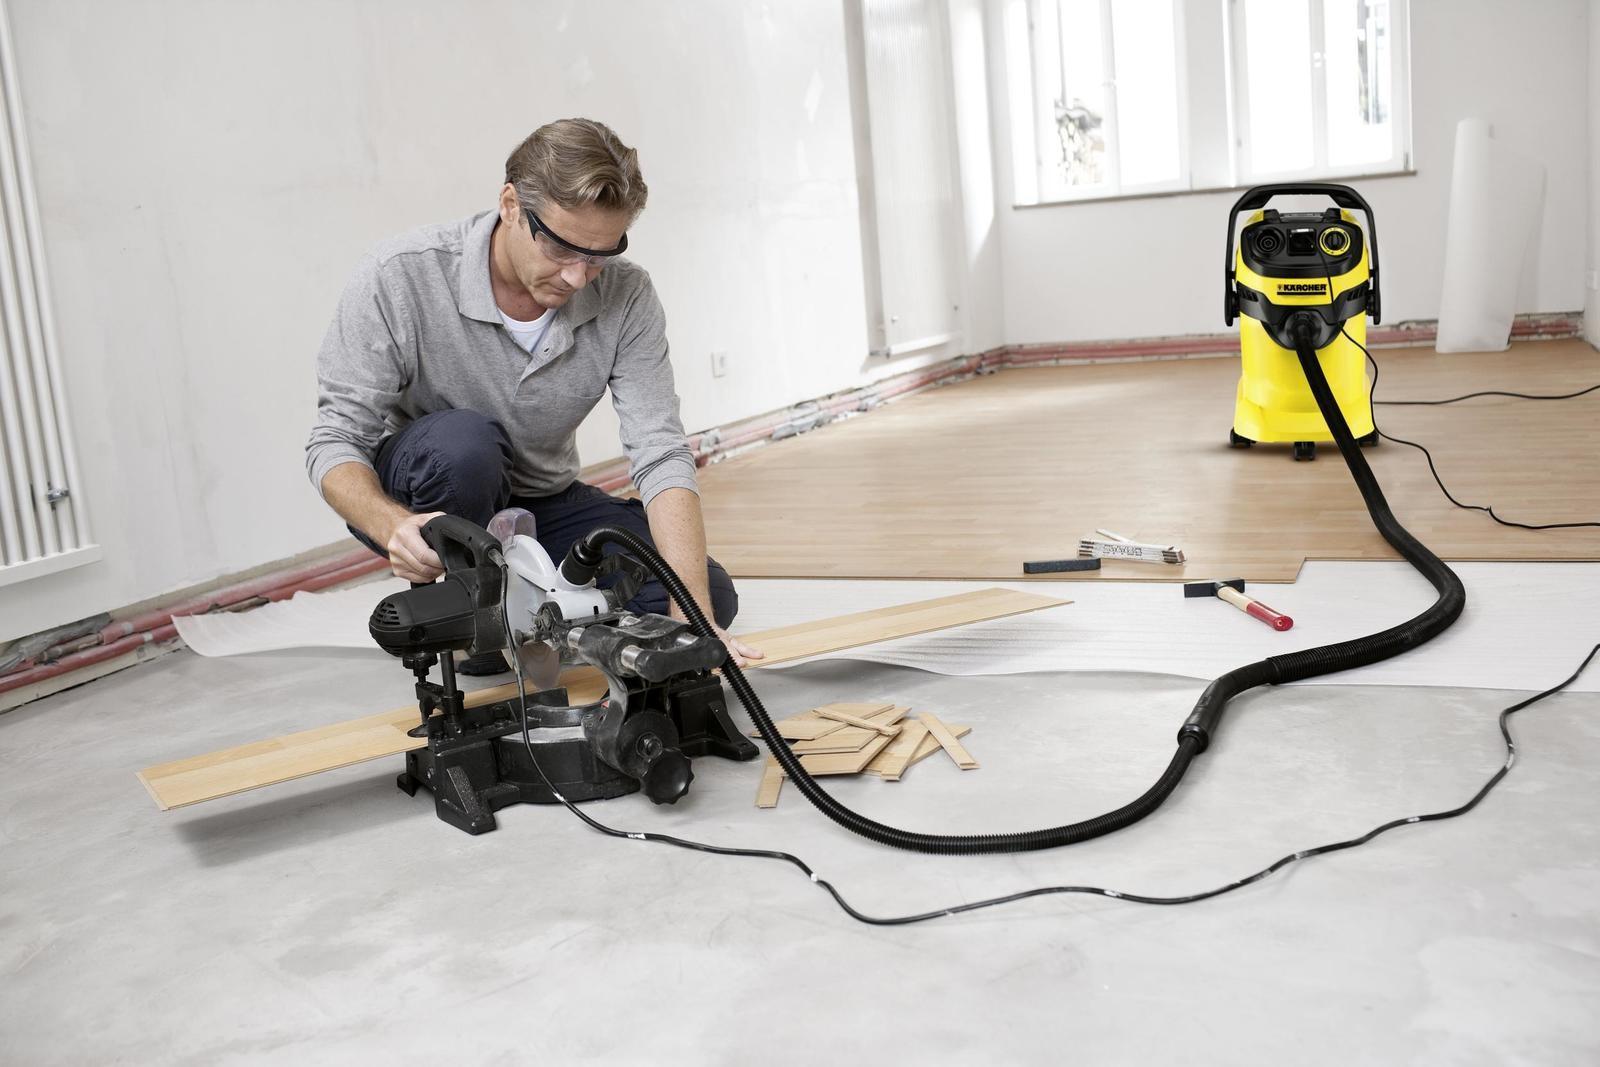 image - What Is the Best Multi-purpose Vacuum Cleaner